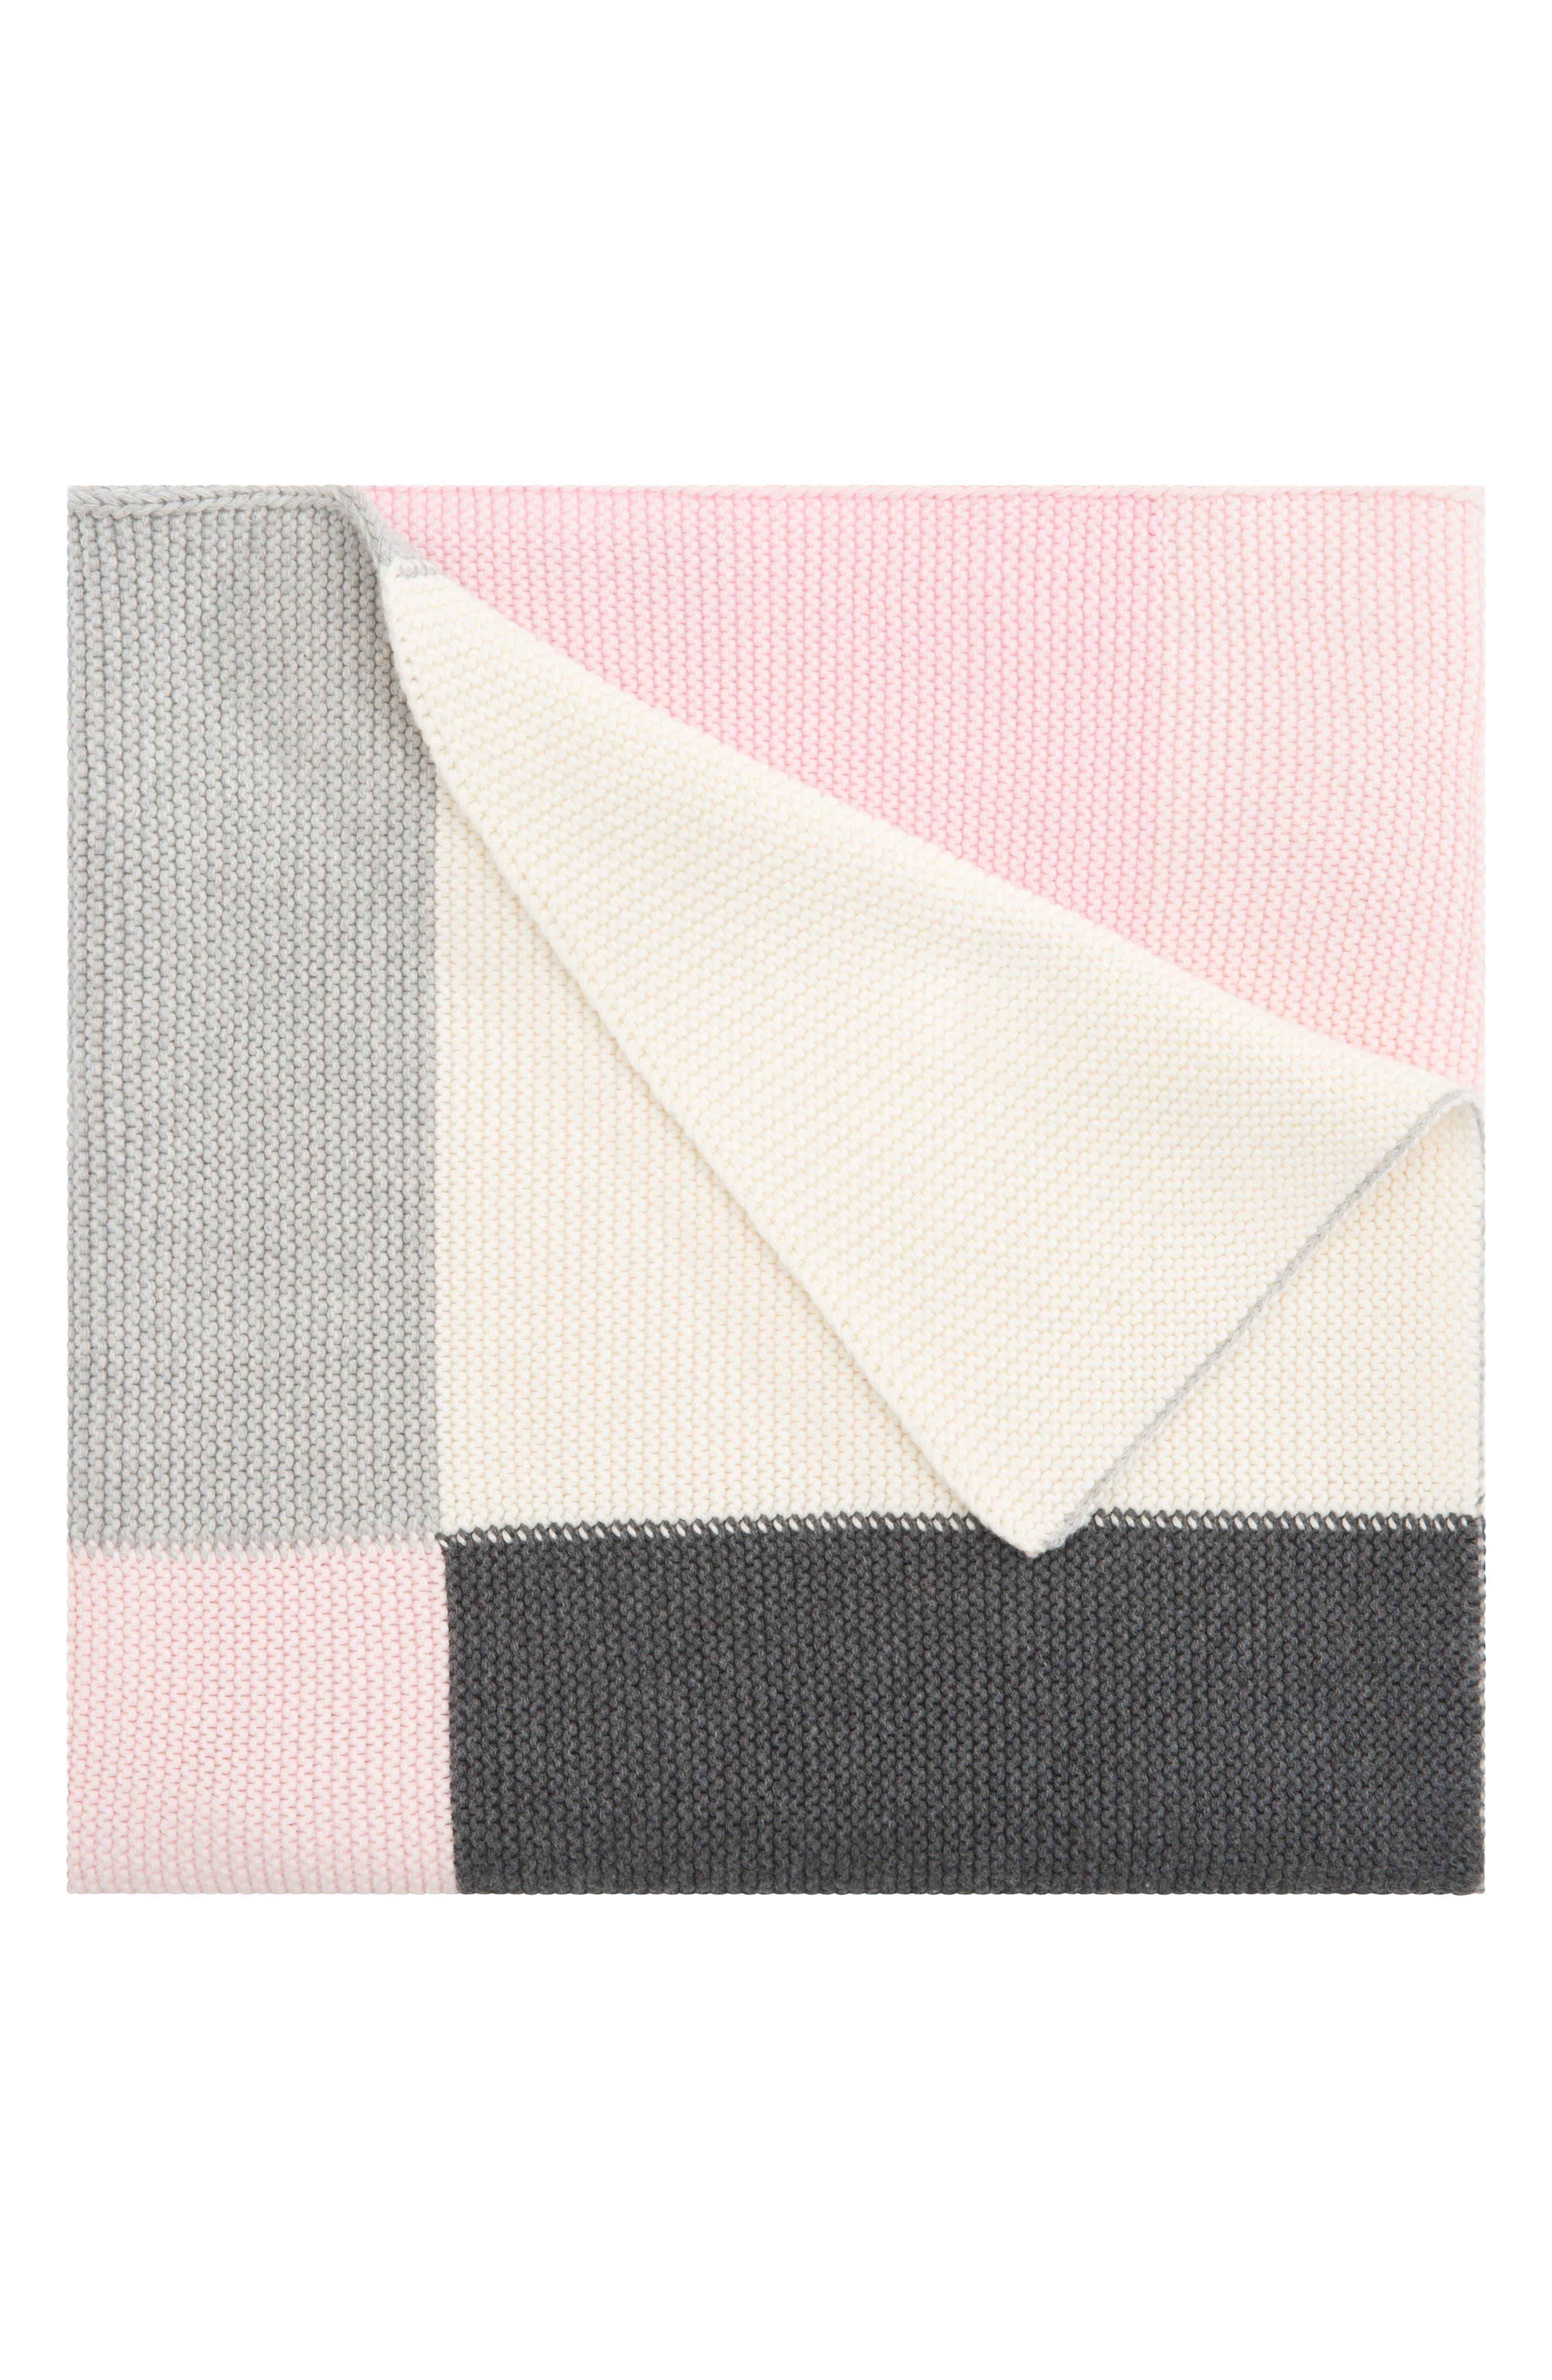 'Patchwork' Knit Blanket,                             Main thumbnail 1, color,                             Light Pink